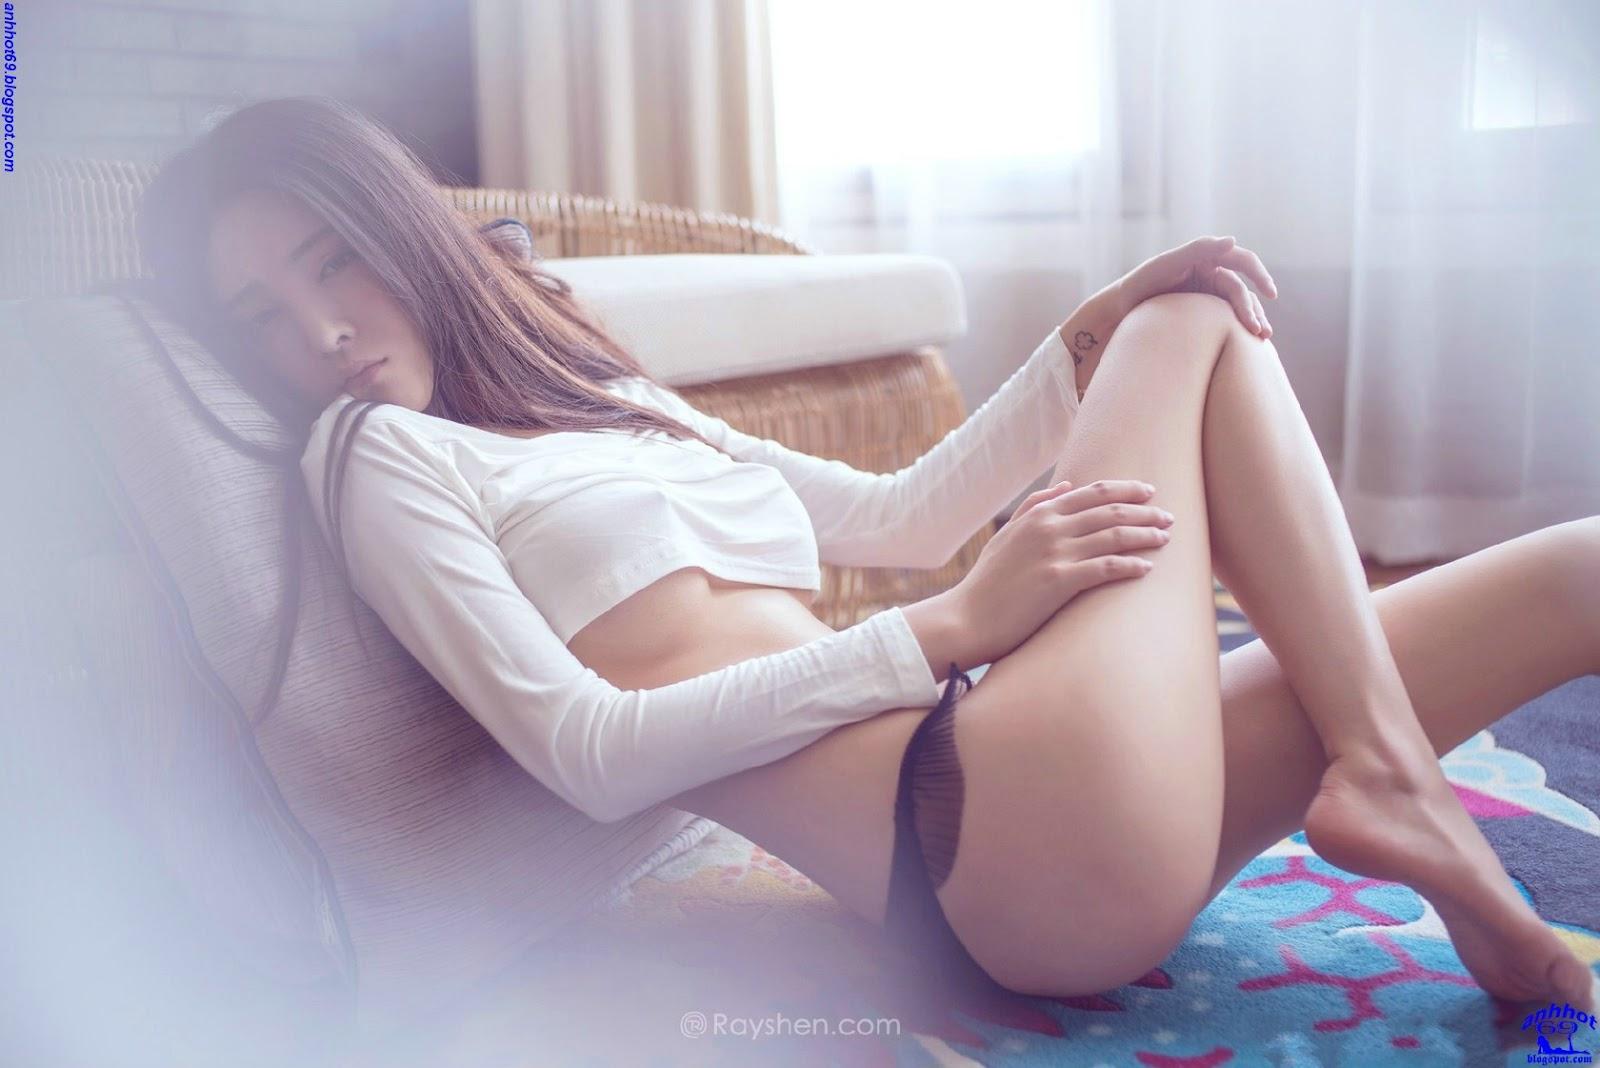 Chen_Darongl_150716_09